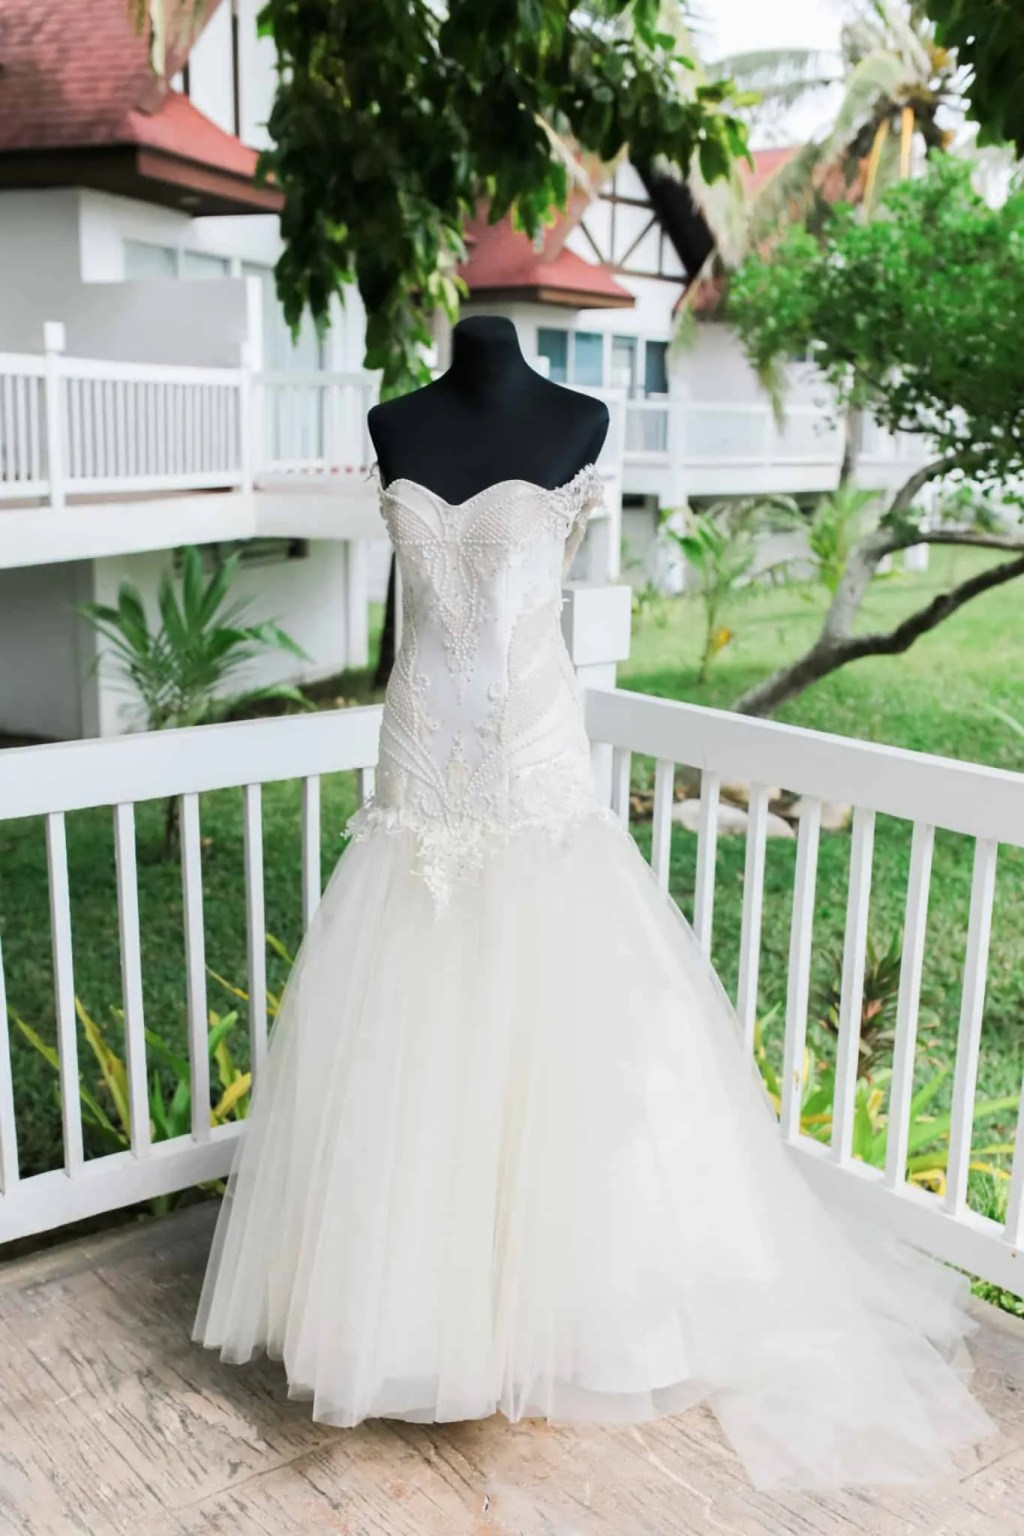 Iloilo Wedding: When Jacq & Rouge Said \'Owl Do\' | The Top Knotters